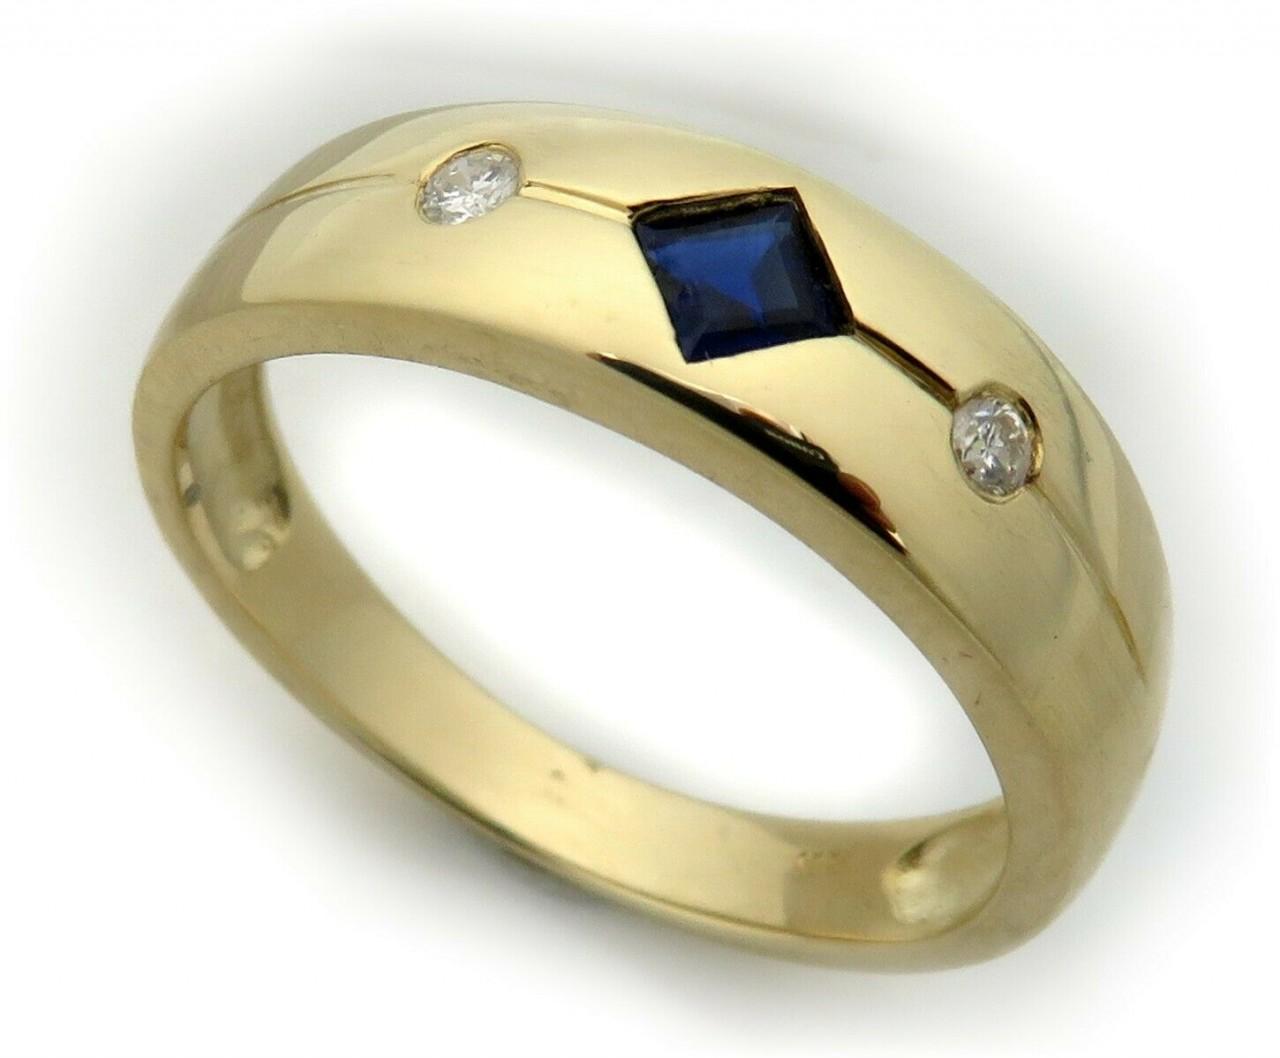 Damen Ring Saphir m. Diamant 0,04ct echt Gold 750 18 karat Gelbgold Brillant Neu